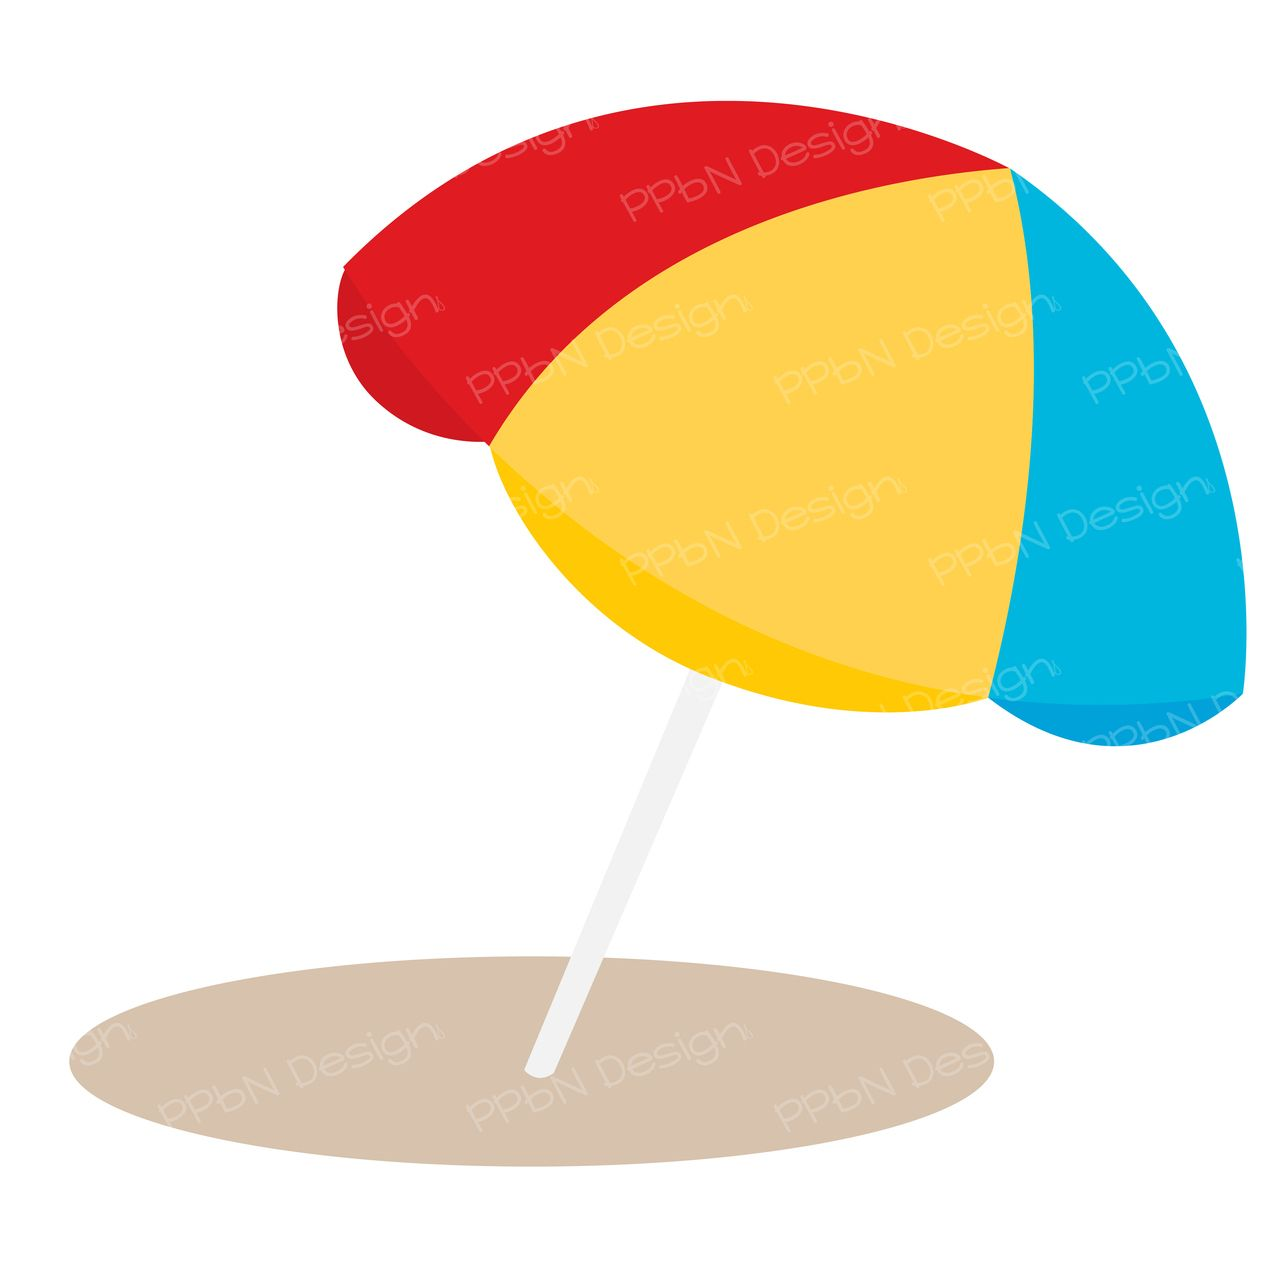 Ppbn Designs  Beach Umbrella  HttpWwwPpbndesignsCom